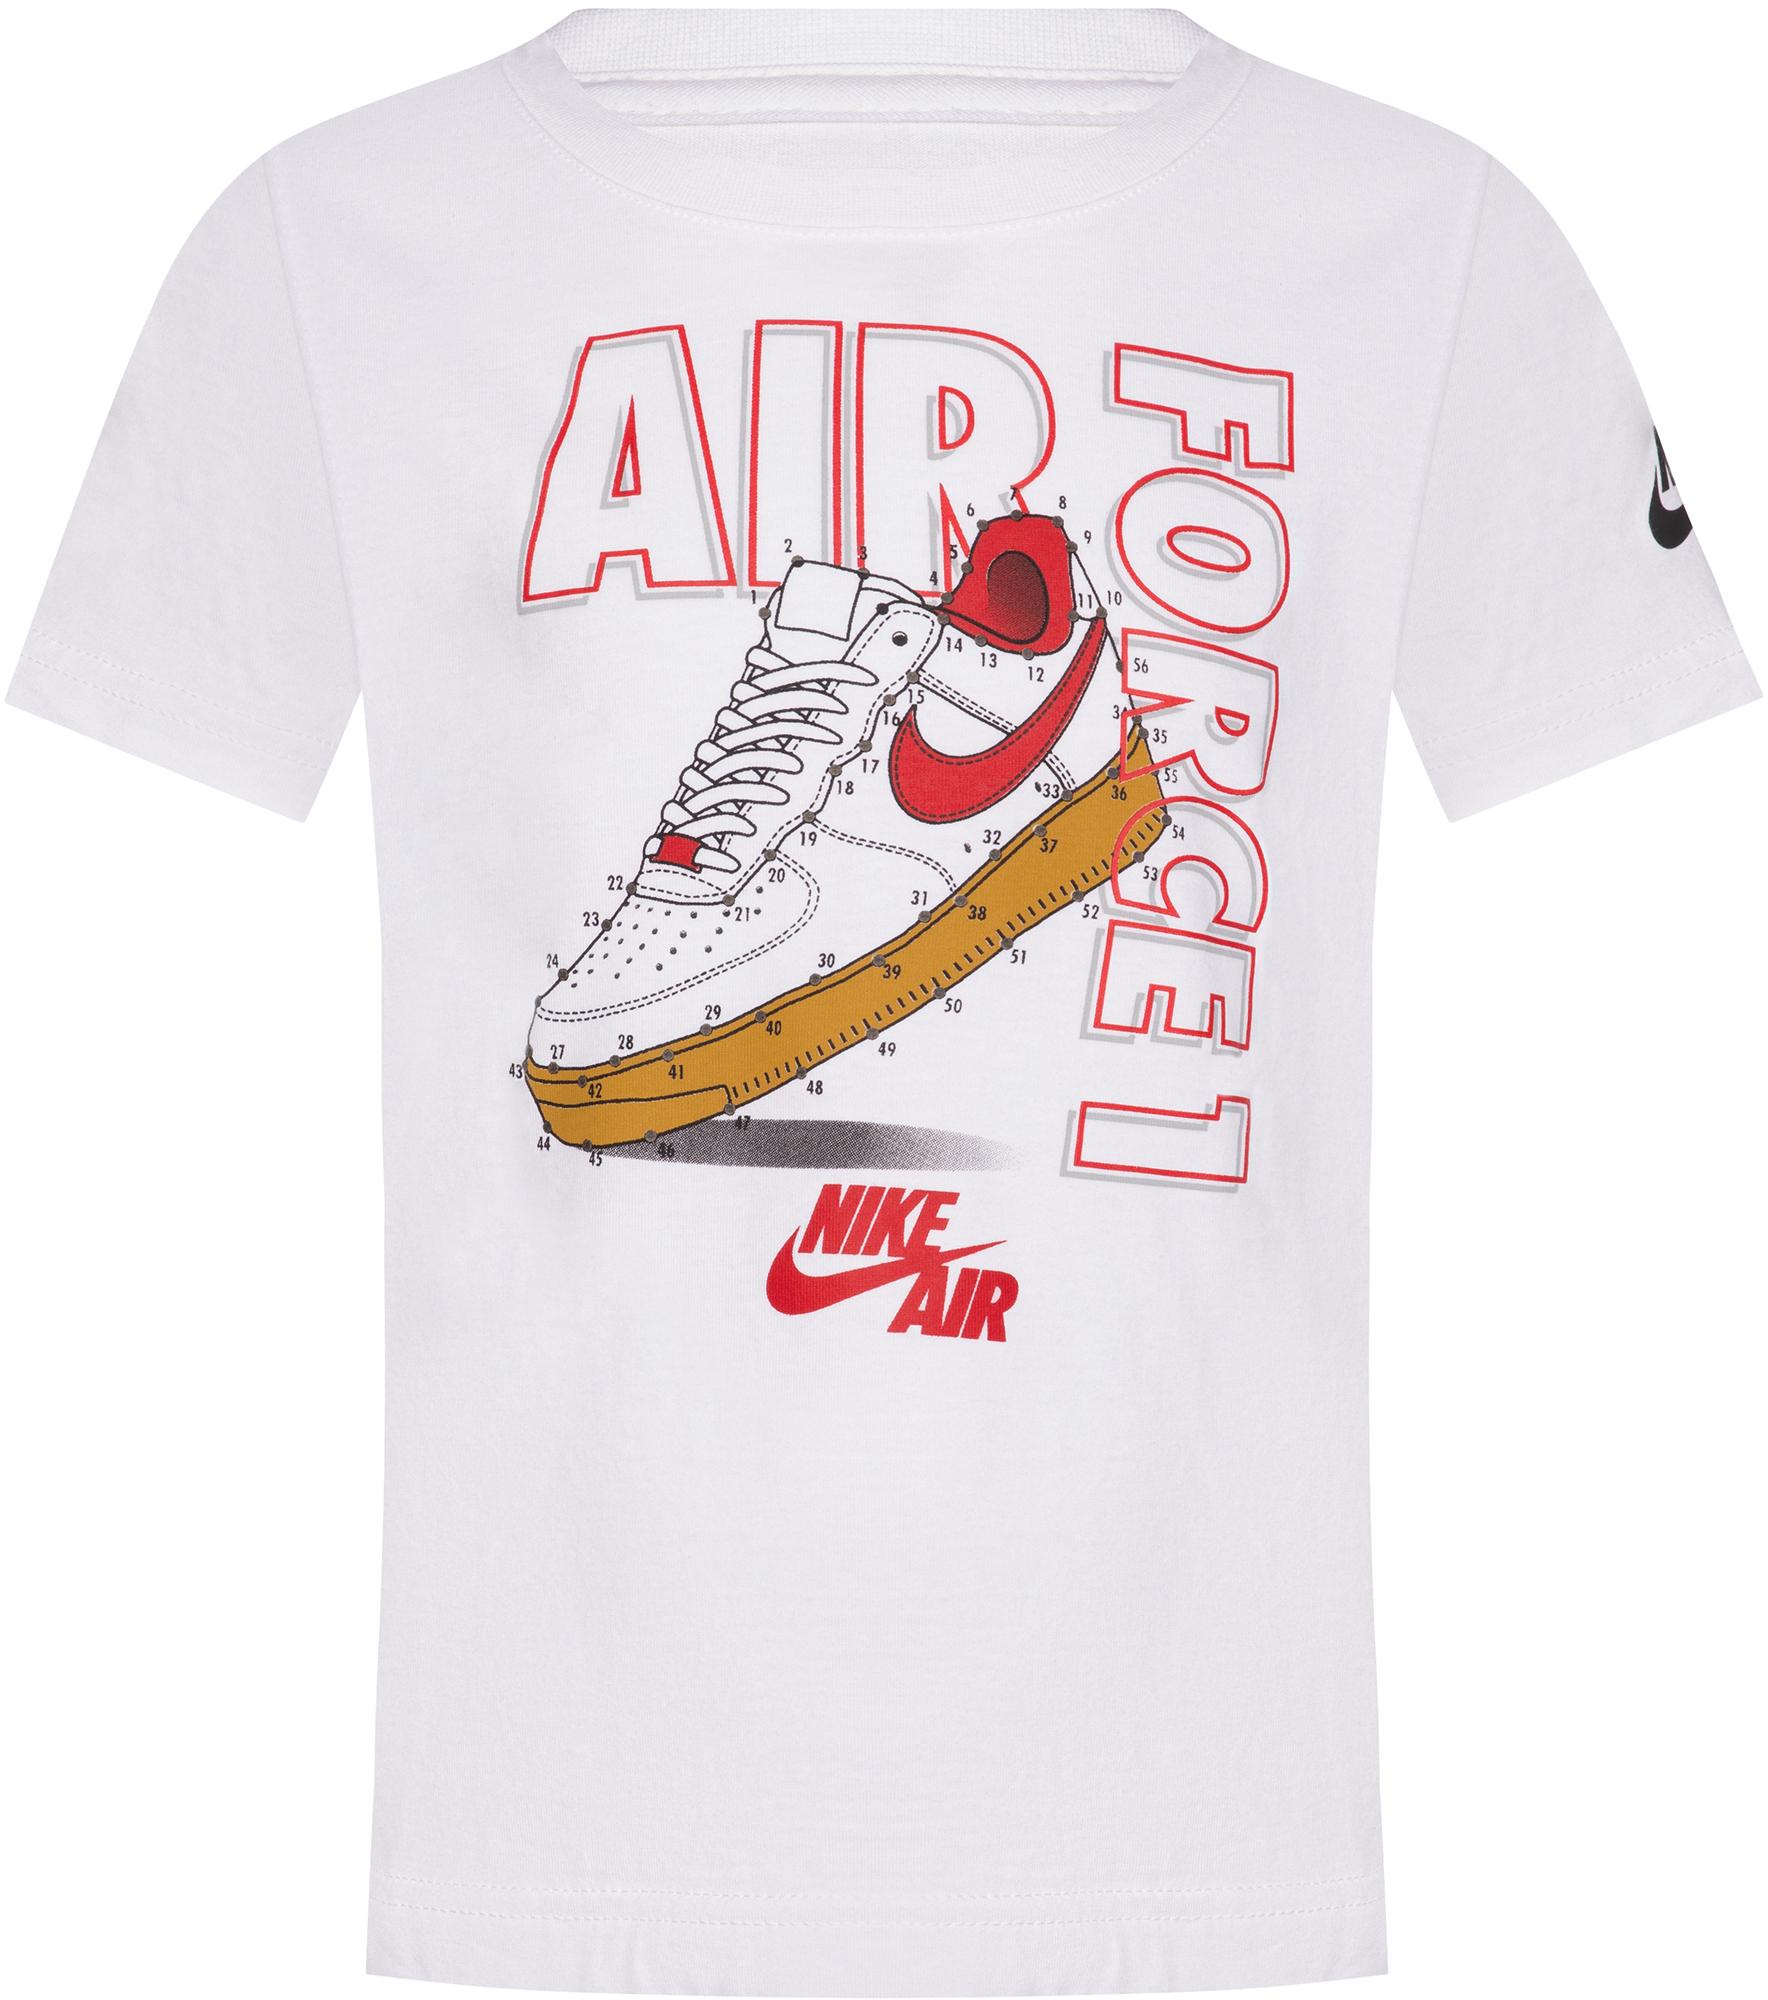 Nike Футболка для мальчиков Nike Connect The Dots, размер 122 nike футболка для мальчиков nike geo basketball